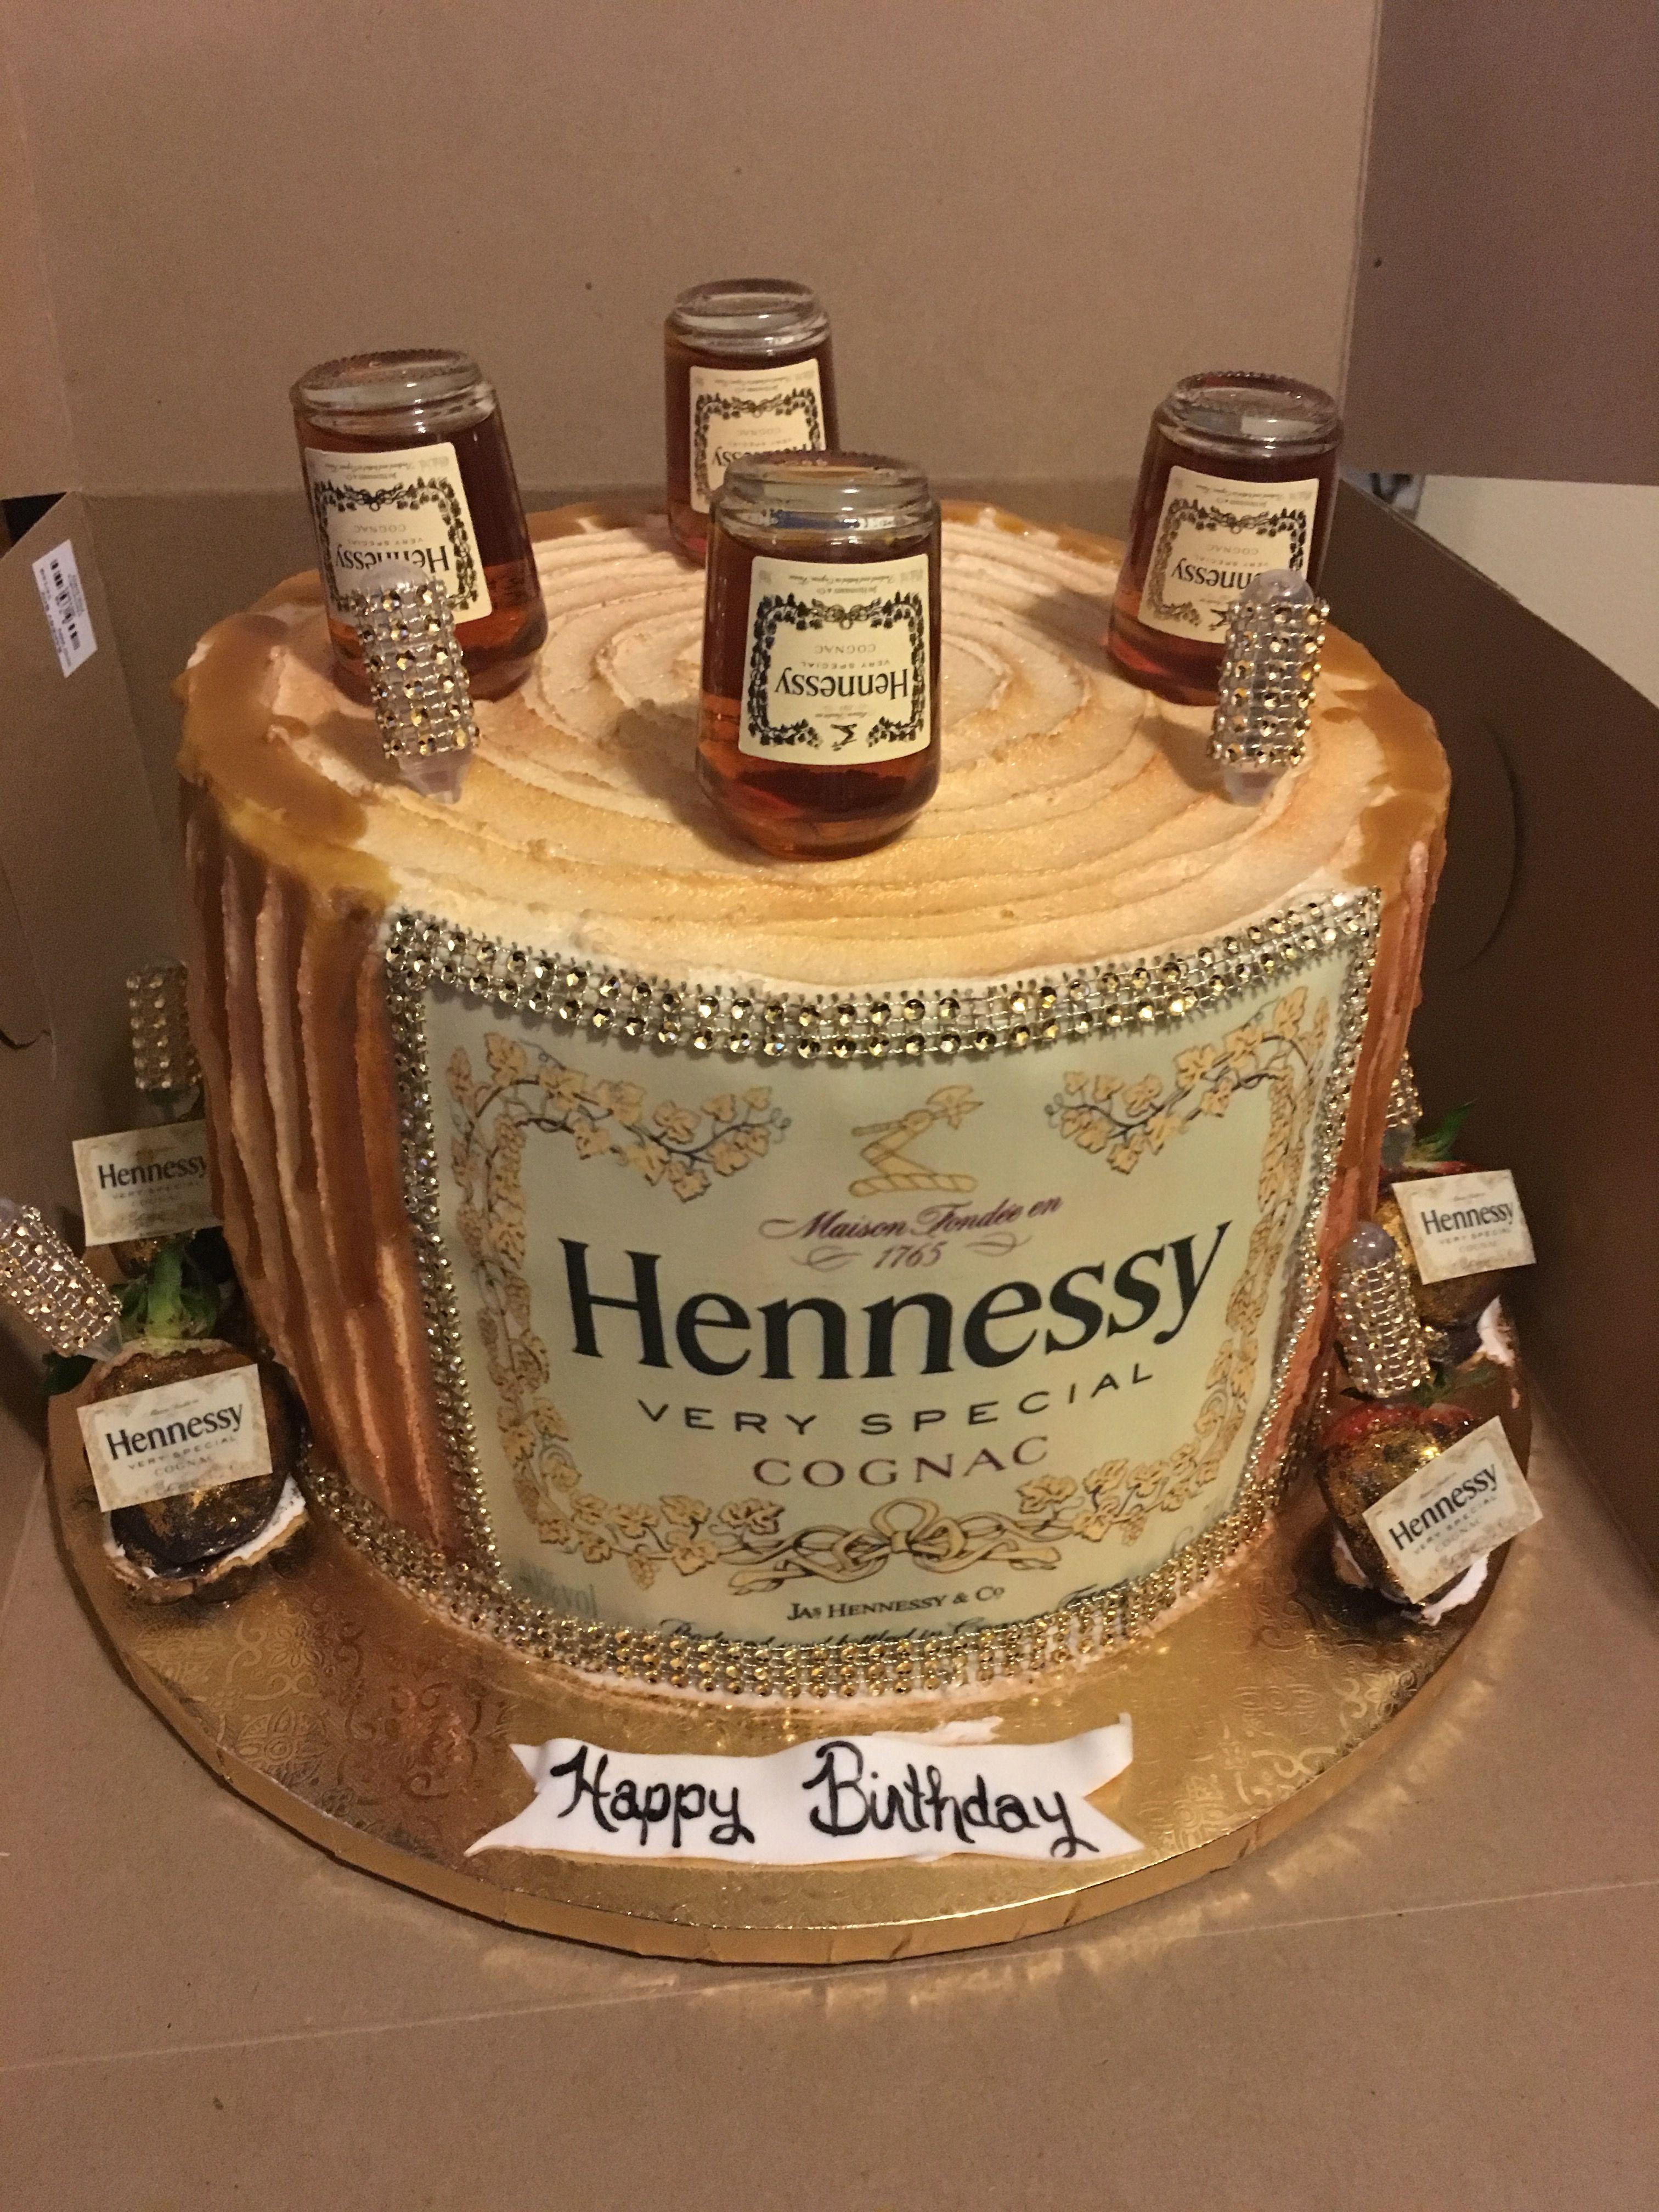 Superb Hennessy Carmel Drip Birthday Cake Birthday Cake For Husband Funny Birthday Cards Online Alyptdamsfinfo